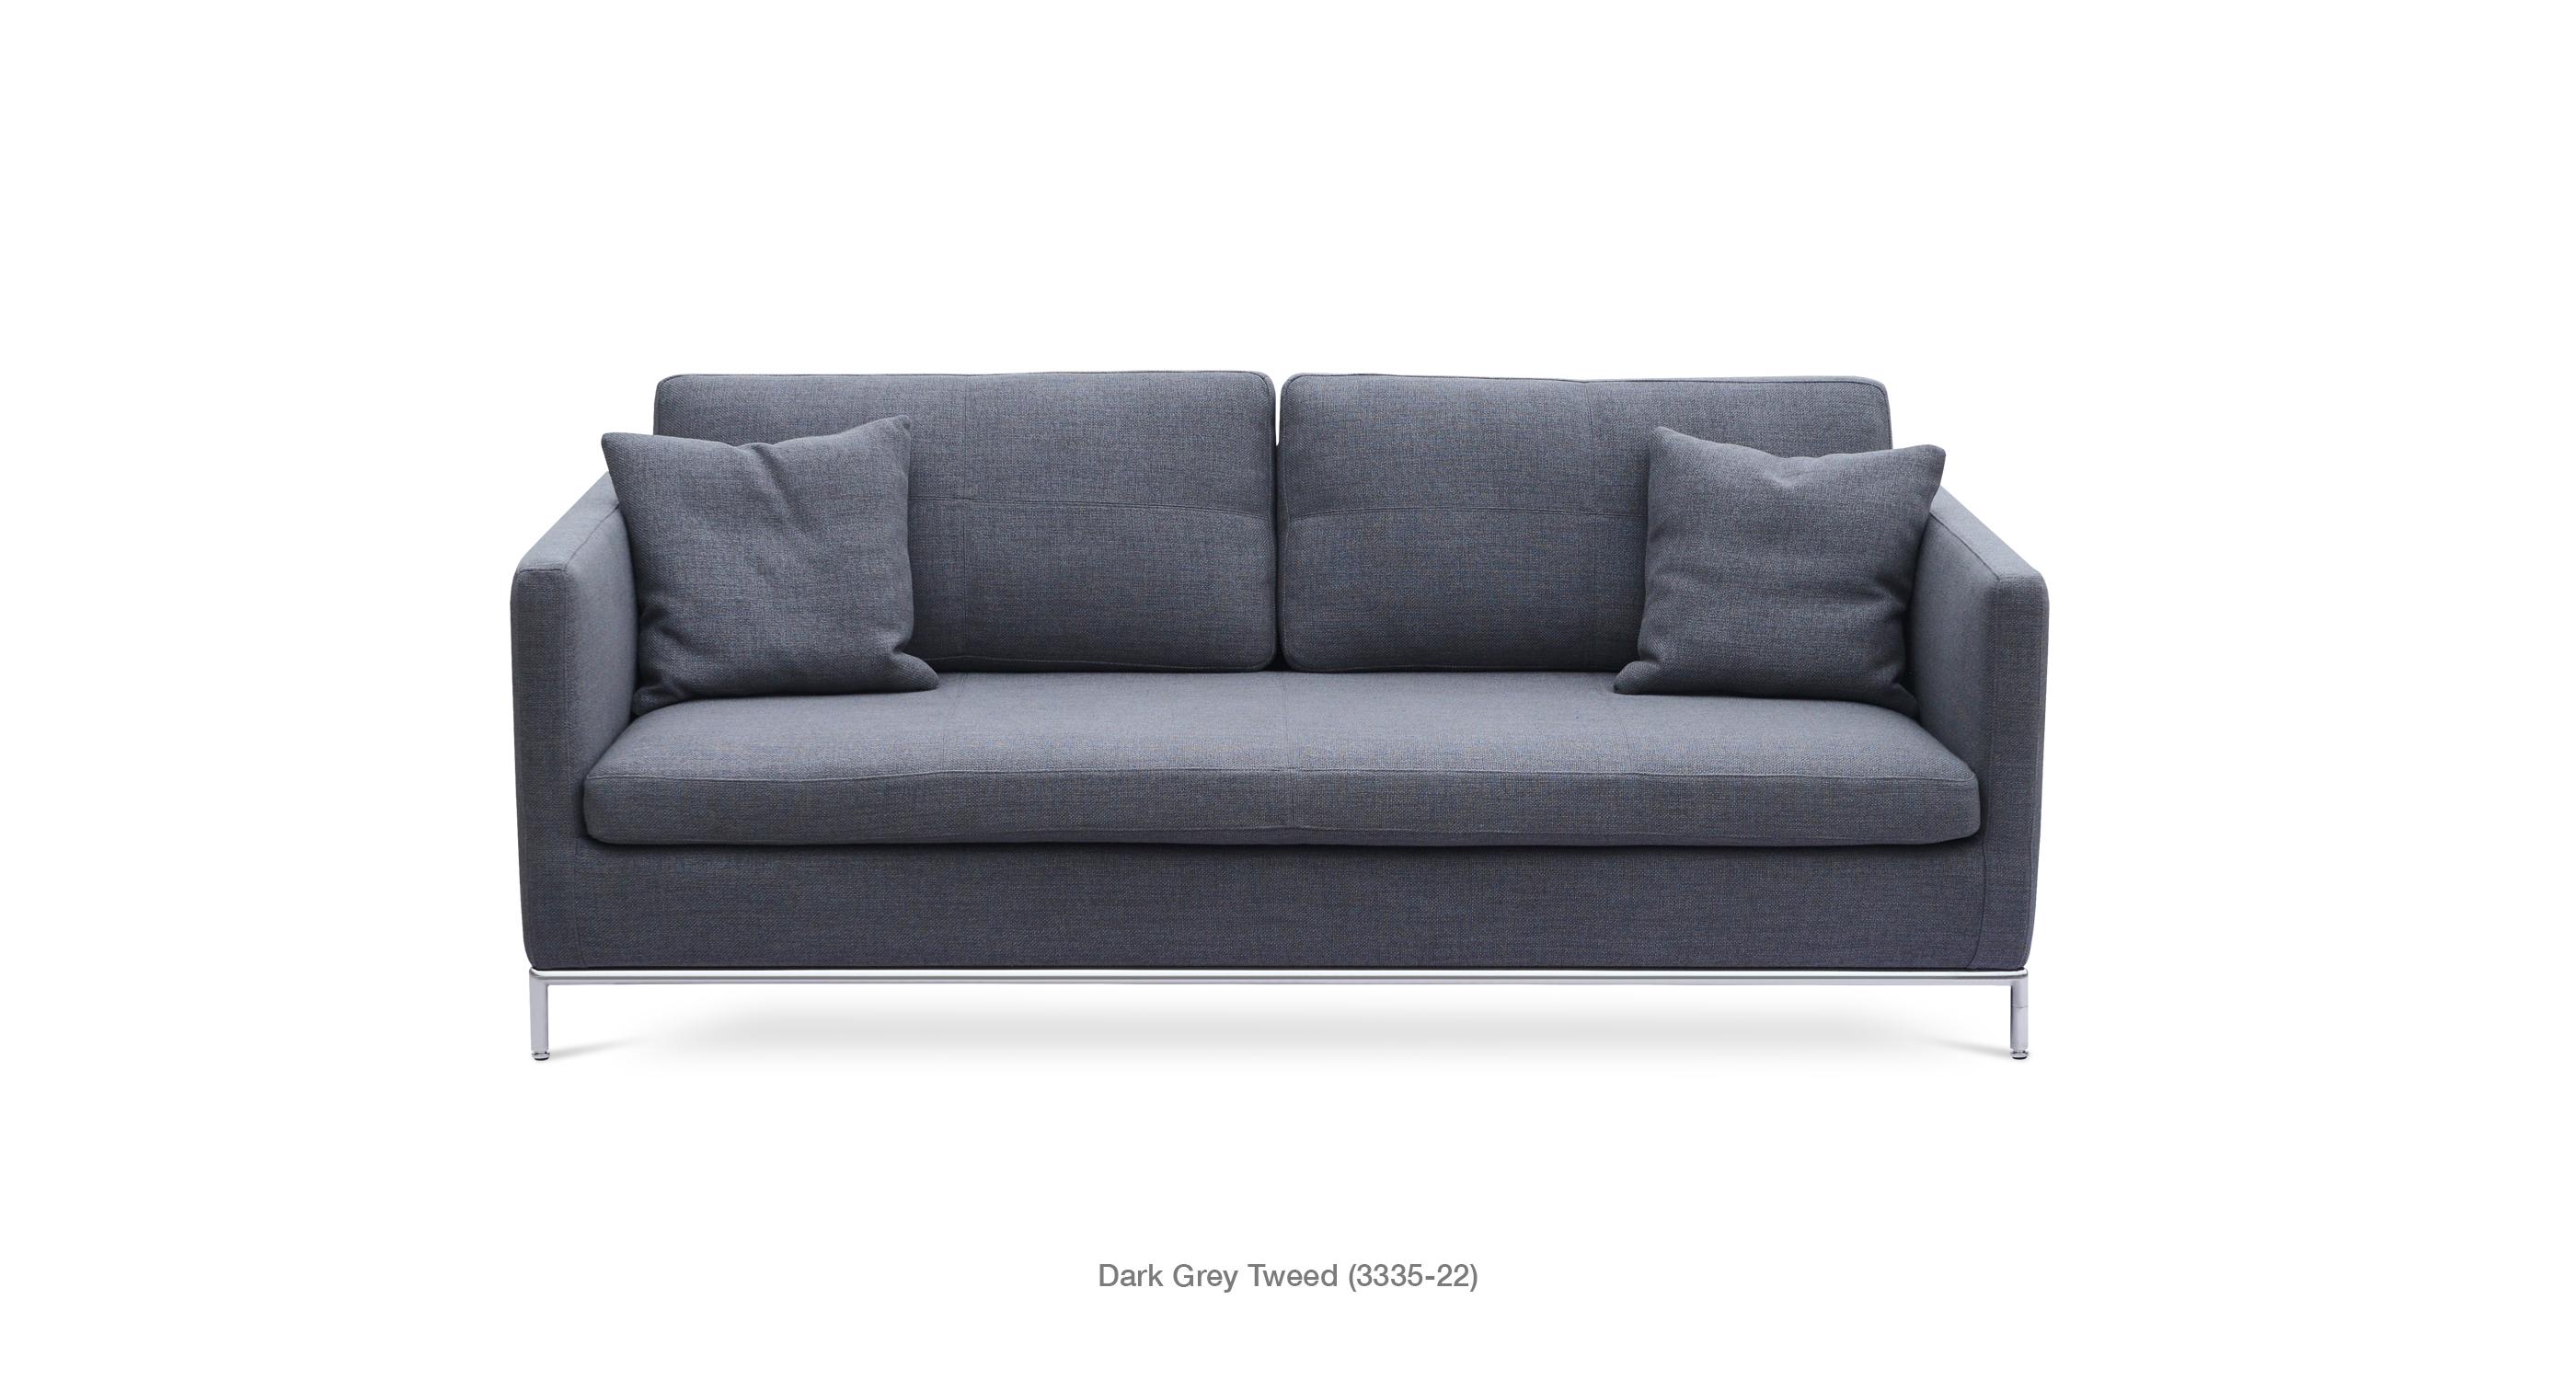 Istanbul Sofa Dark Grey Tweed